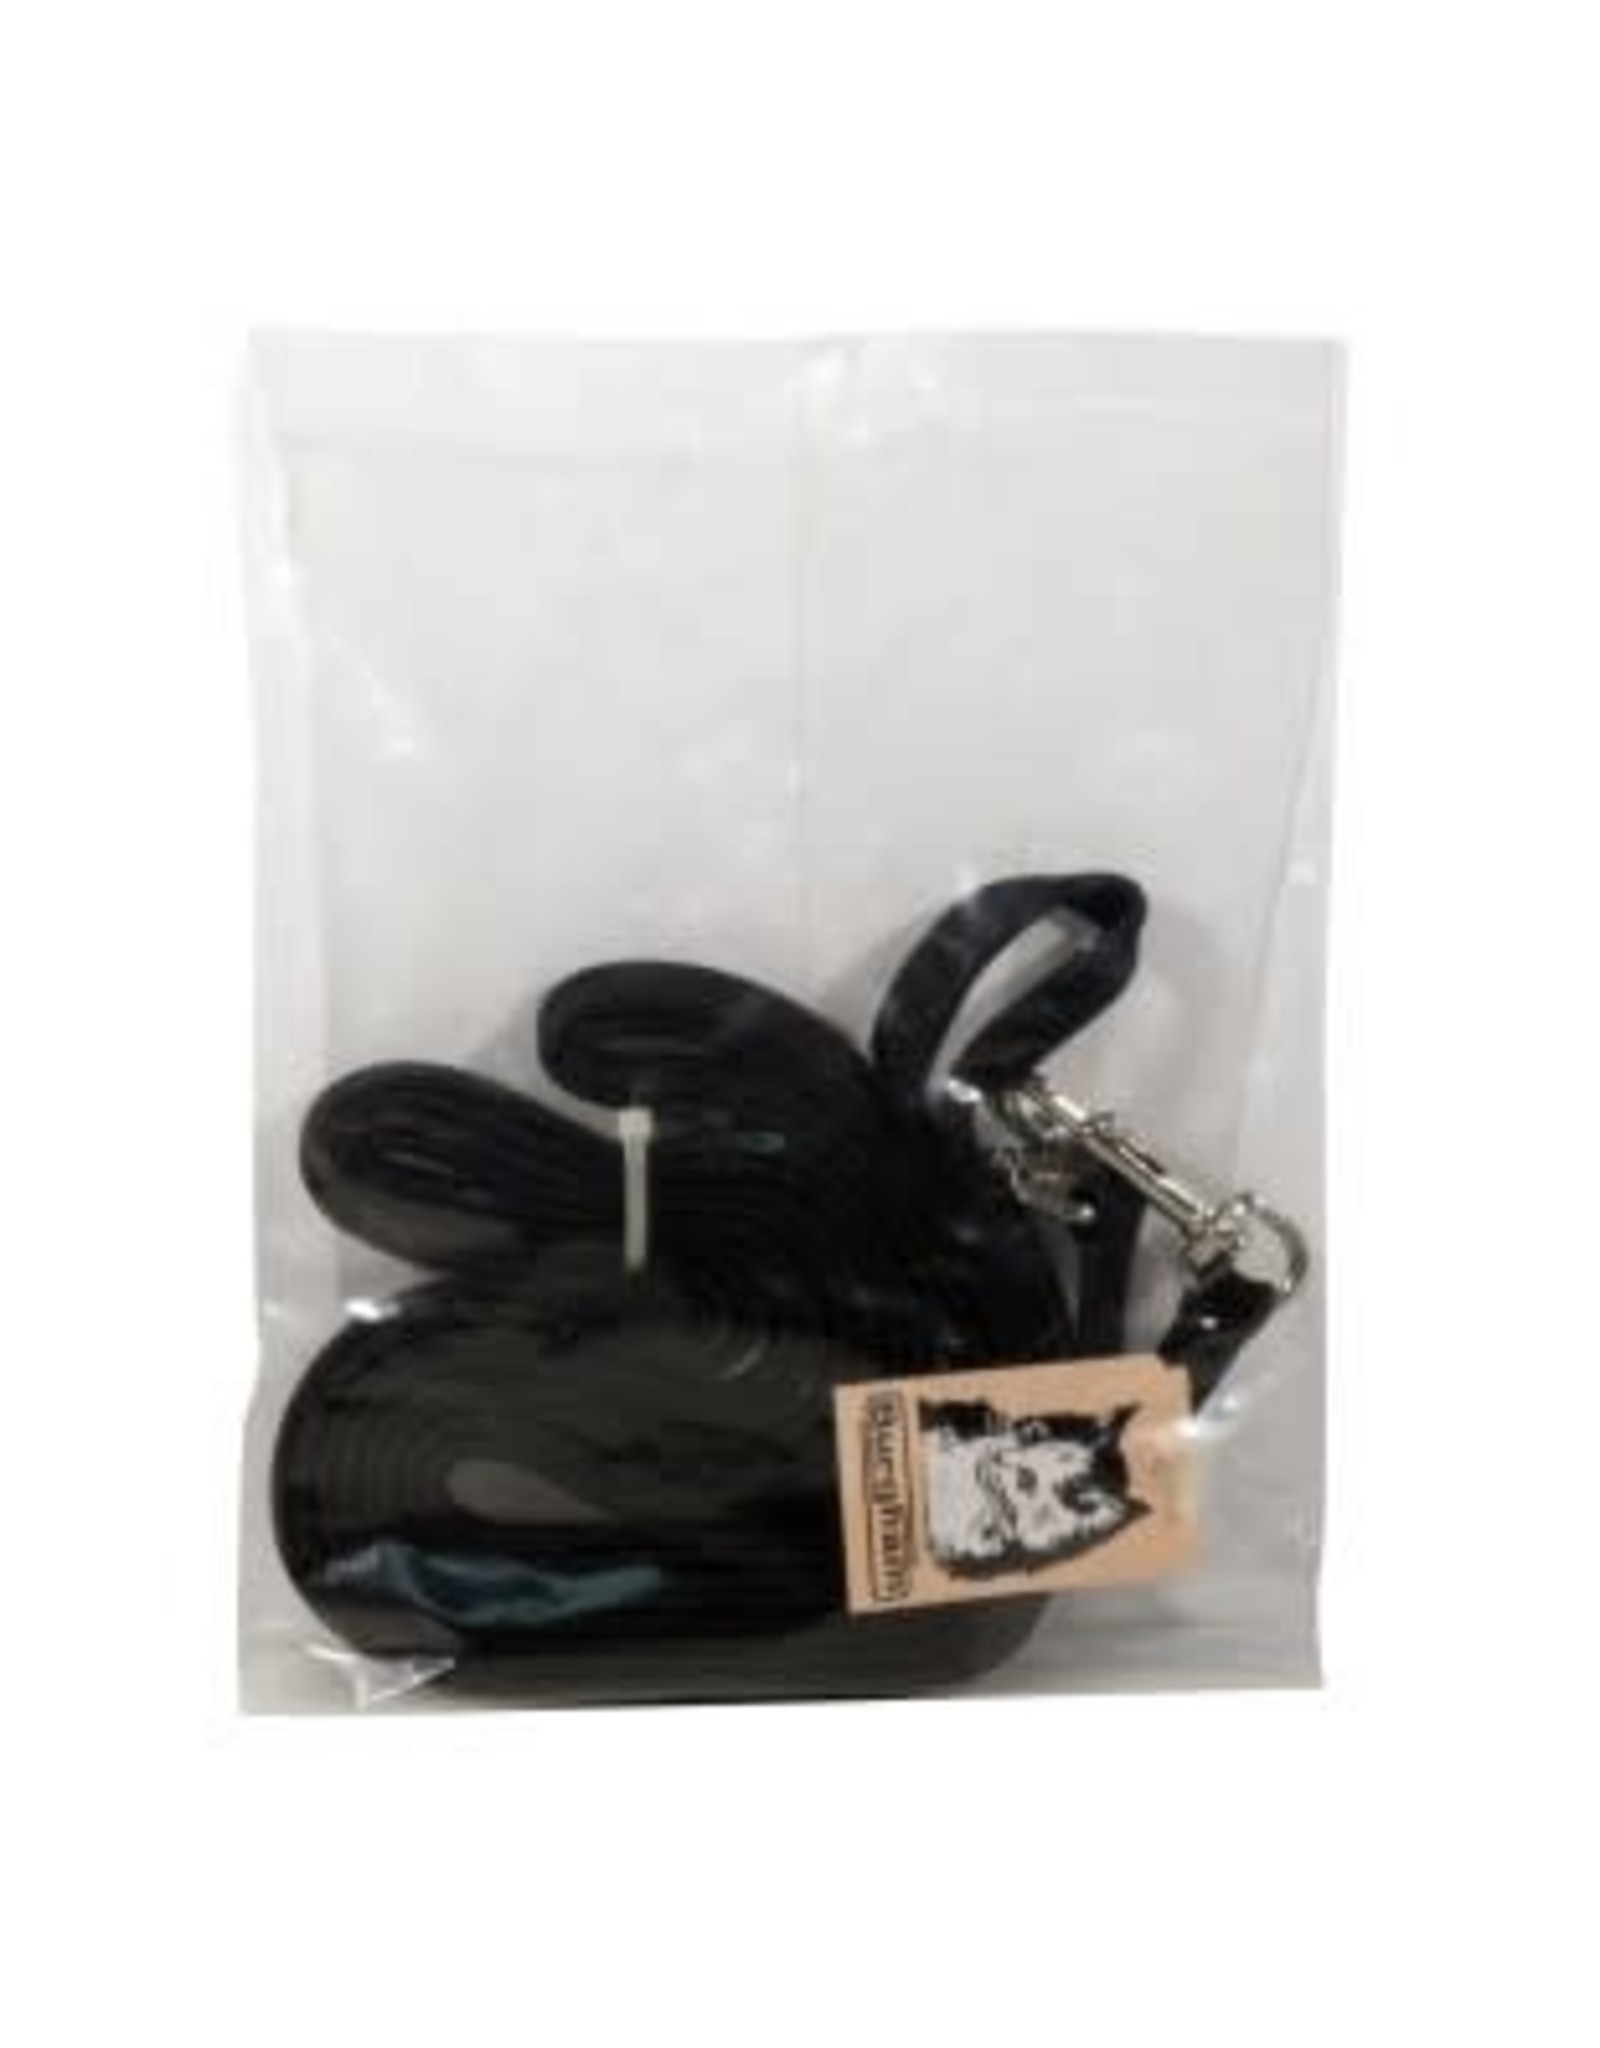 Burgham BURG Nylon Cat TieOut 10' Black